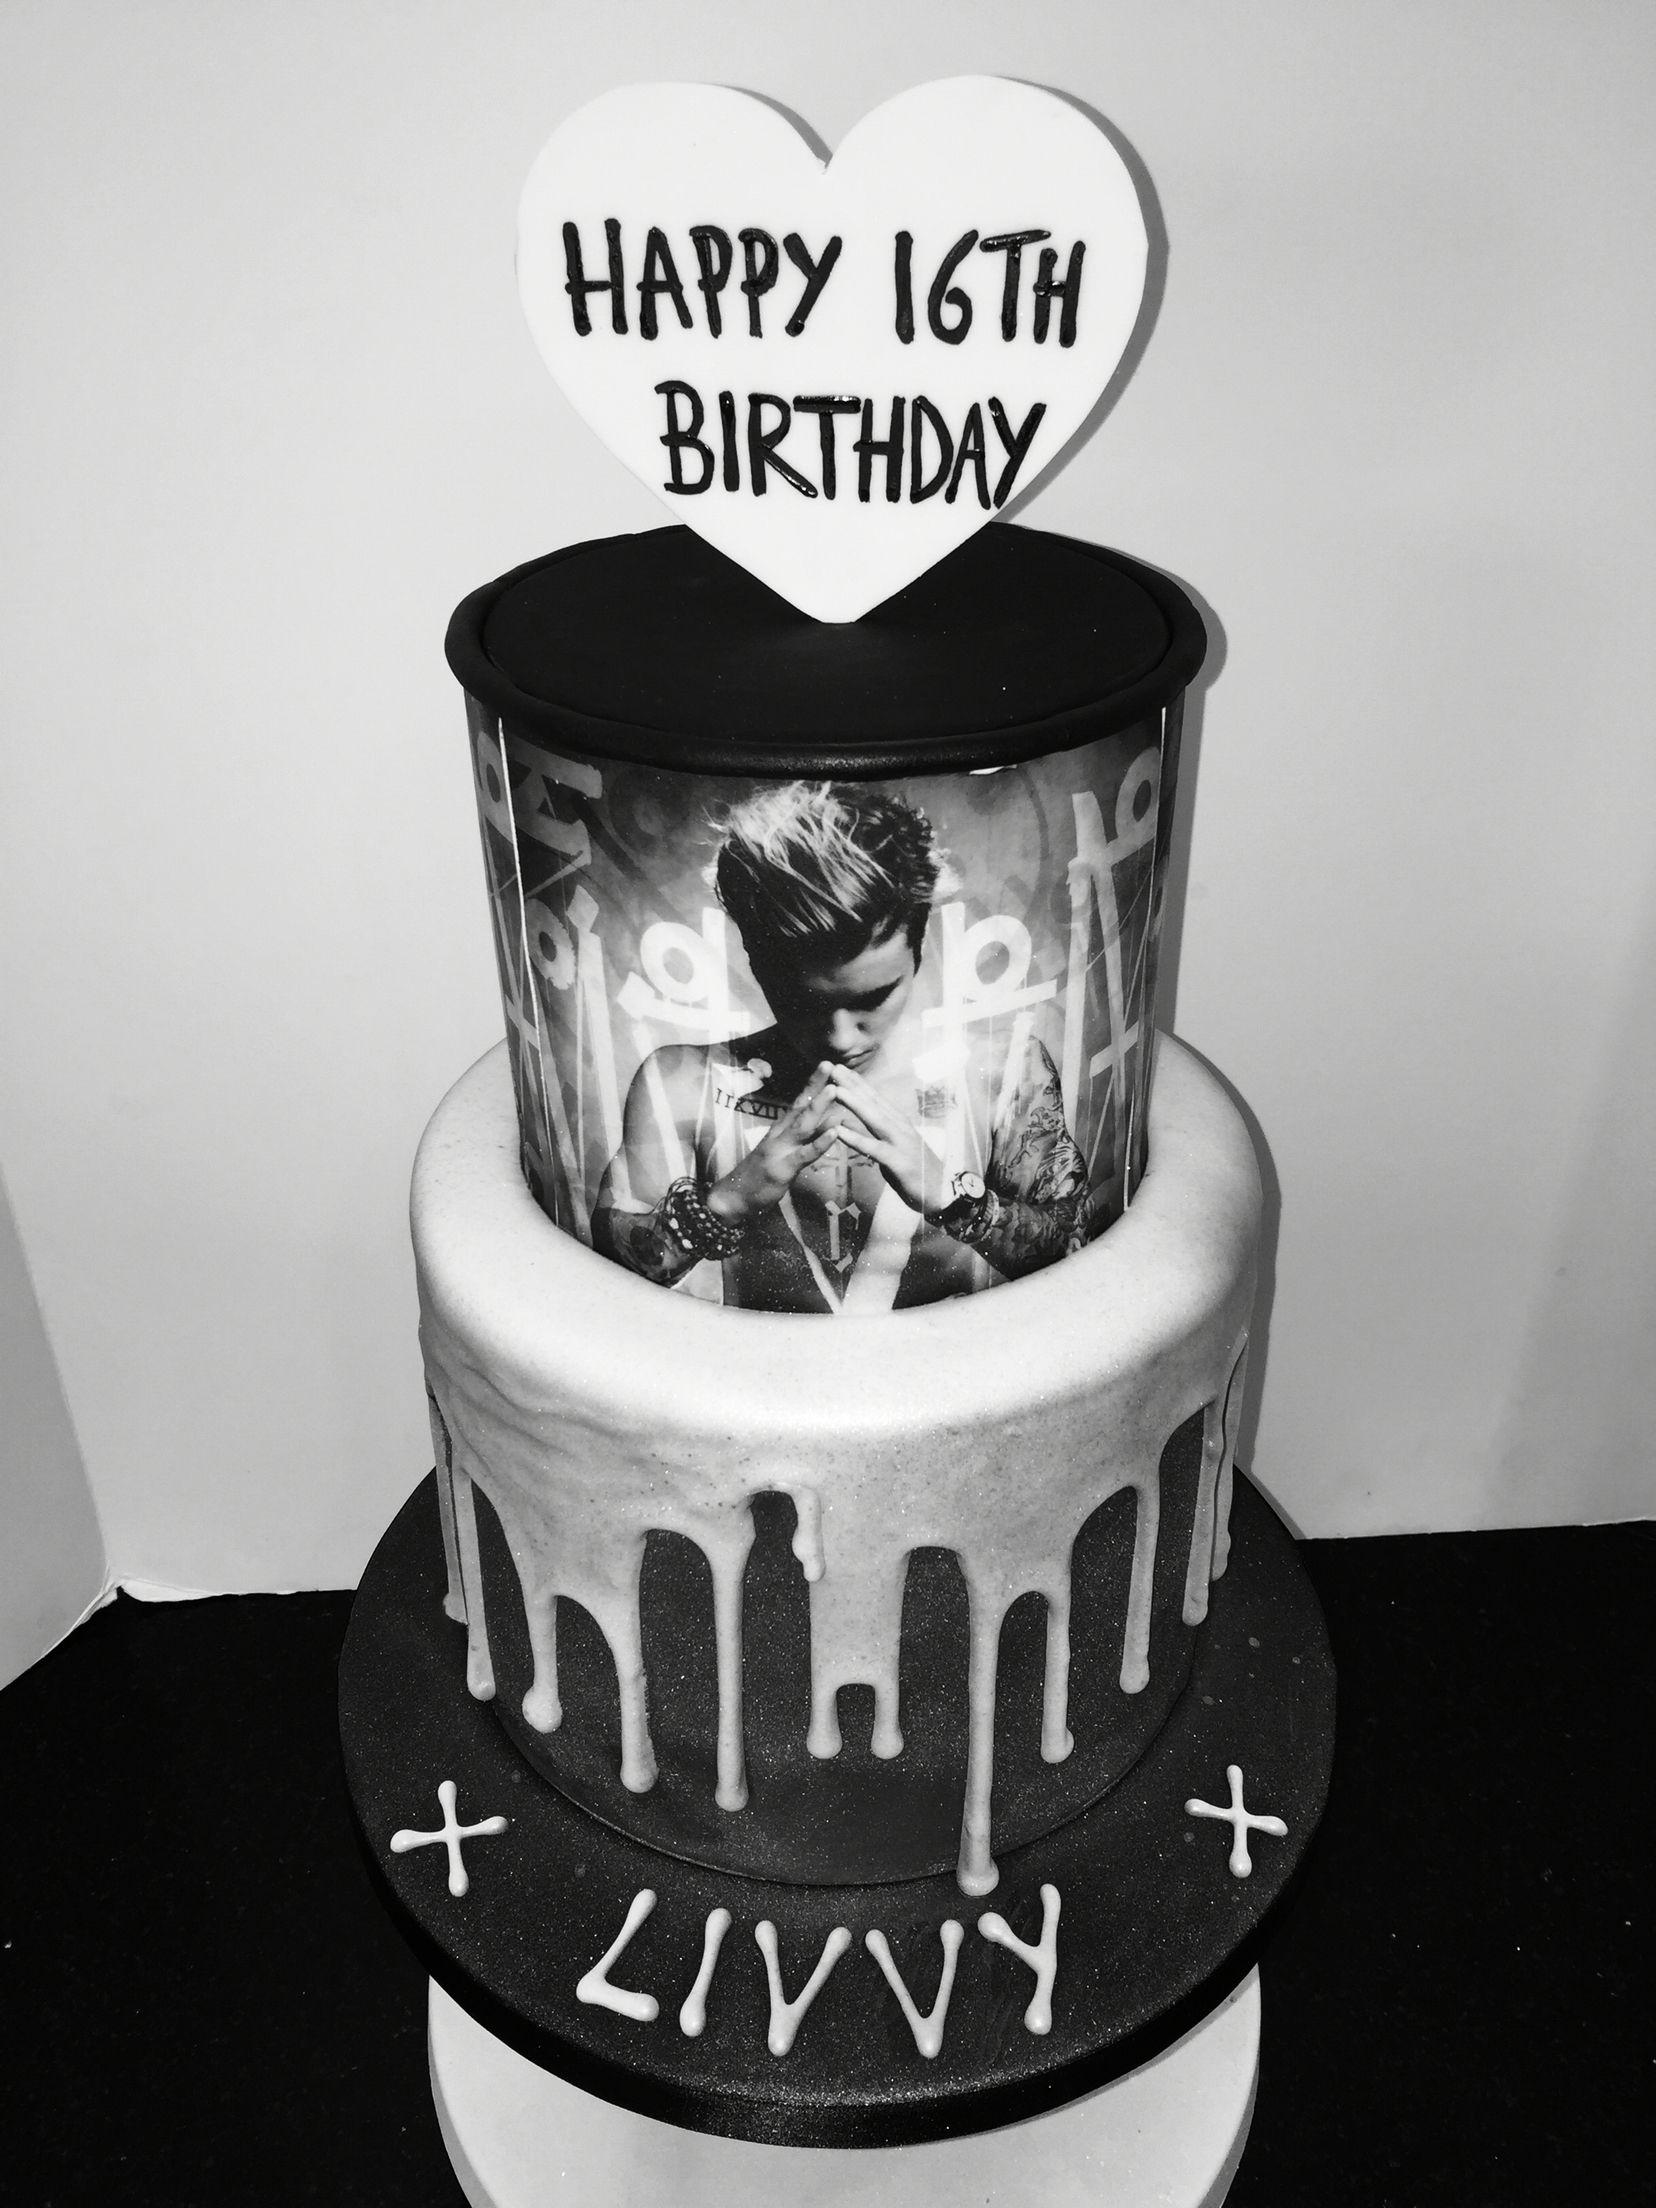 Justin bieber scrapbook ideas - Justin Bieber Birthday Cake Twenty One Pilots Would Be Waay Better